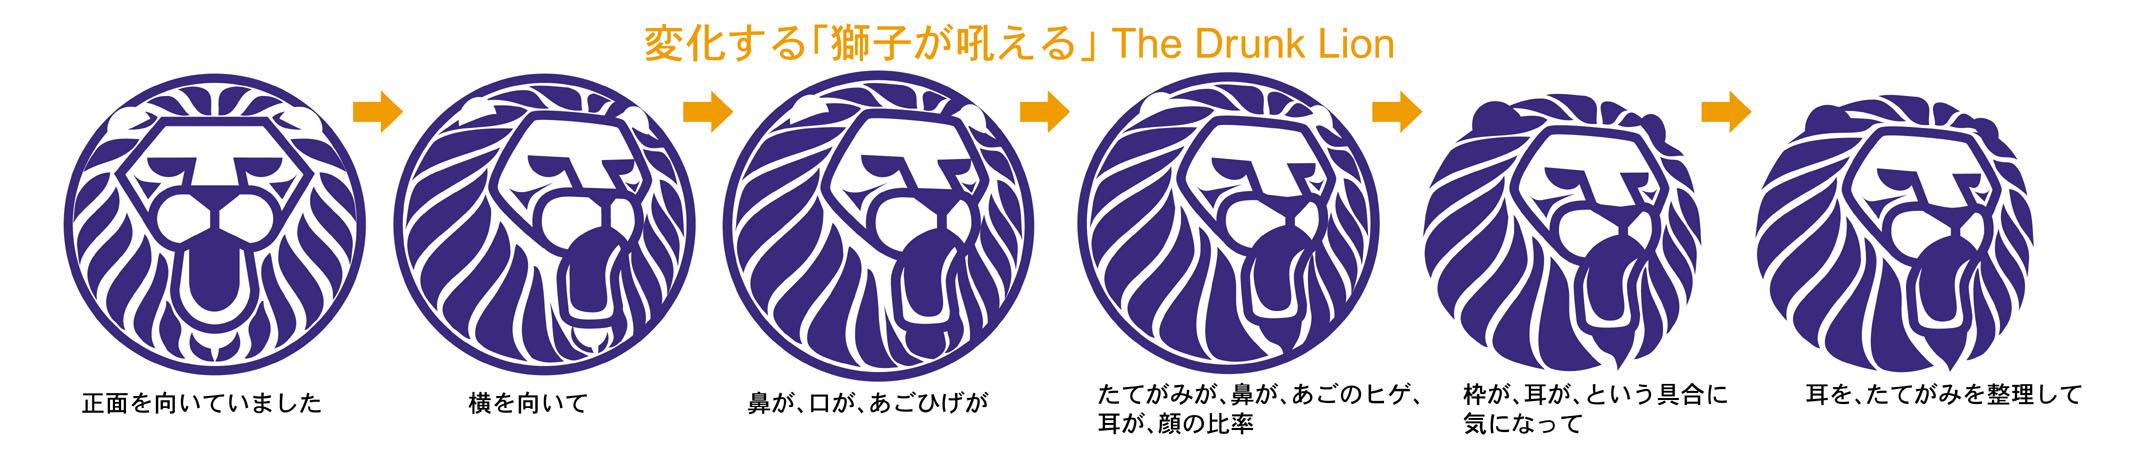 獅子は6回変身